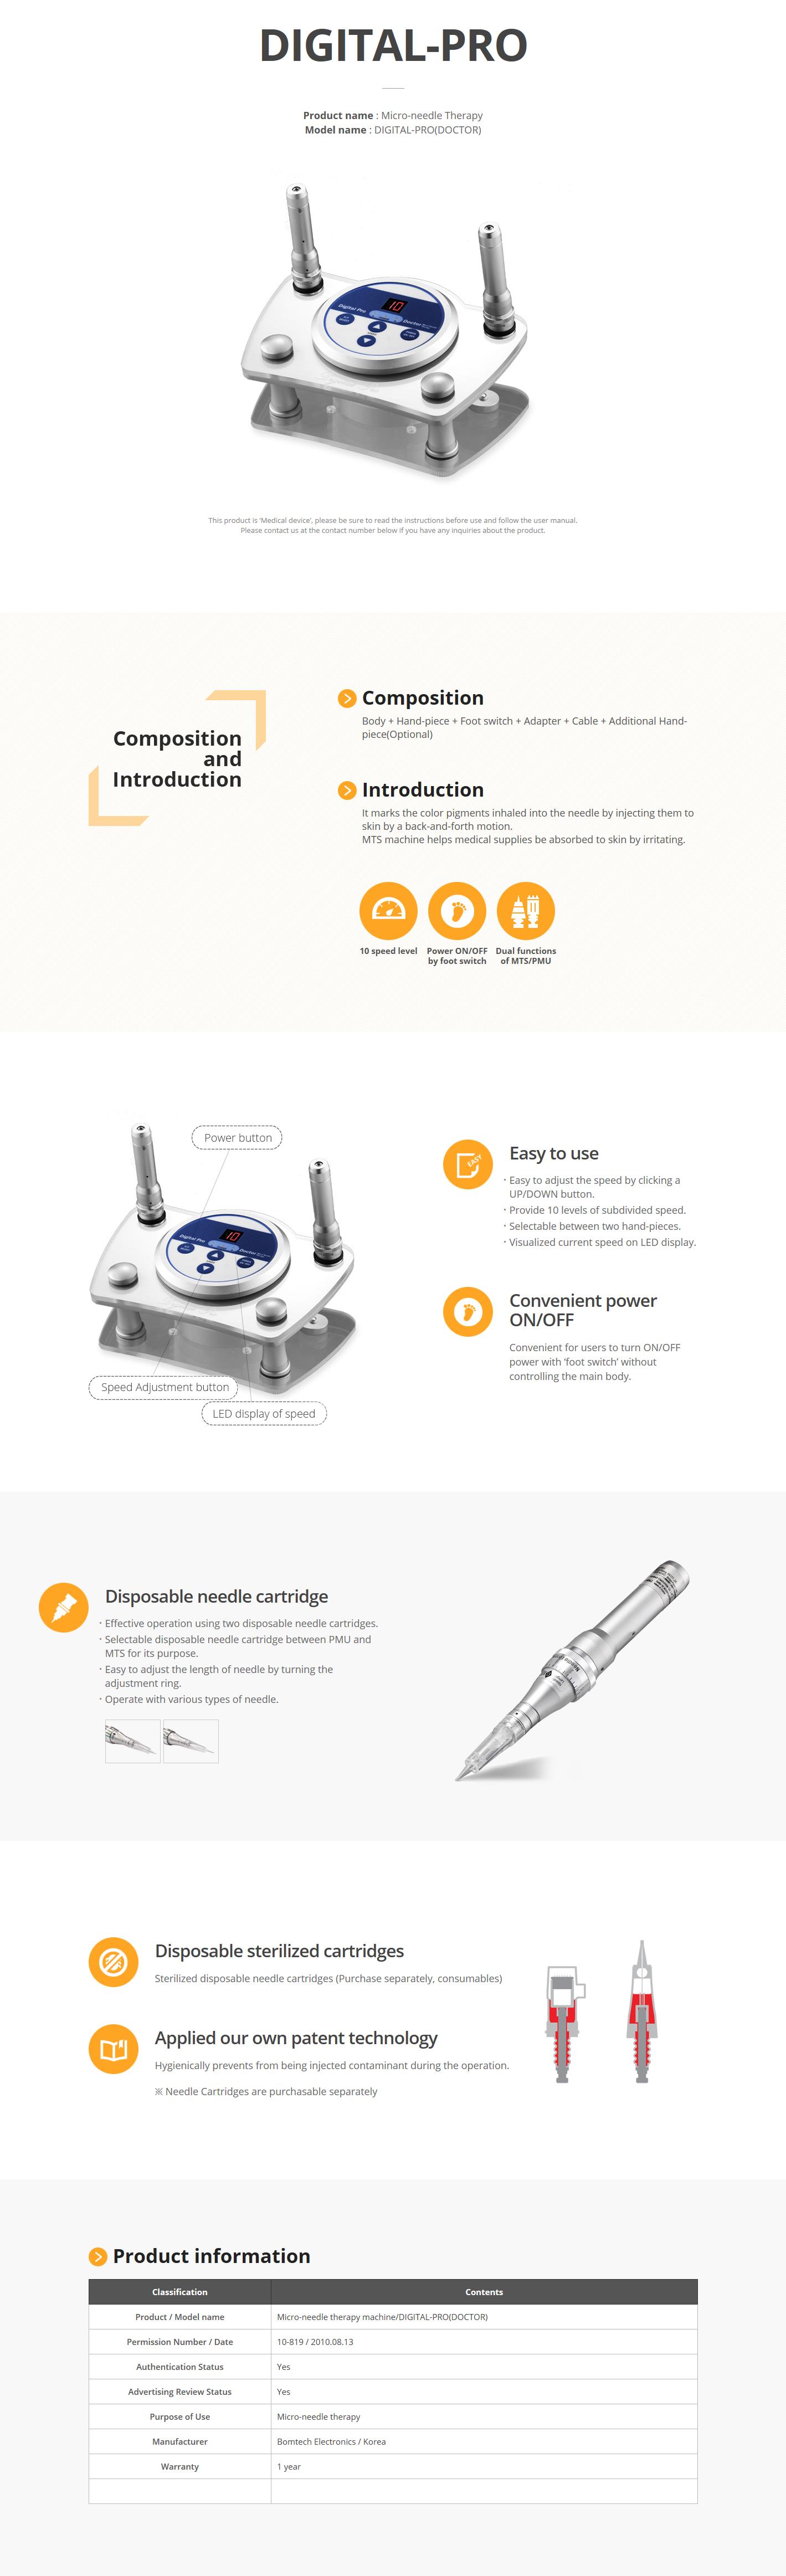 Bomtech Micro-needle Therapy DIGITAL-PRO